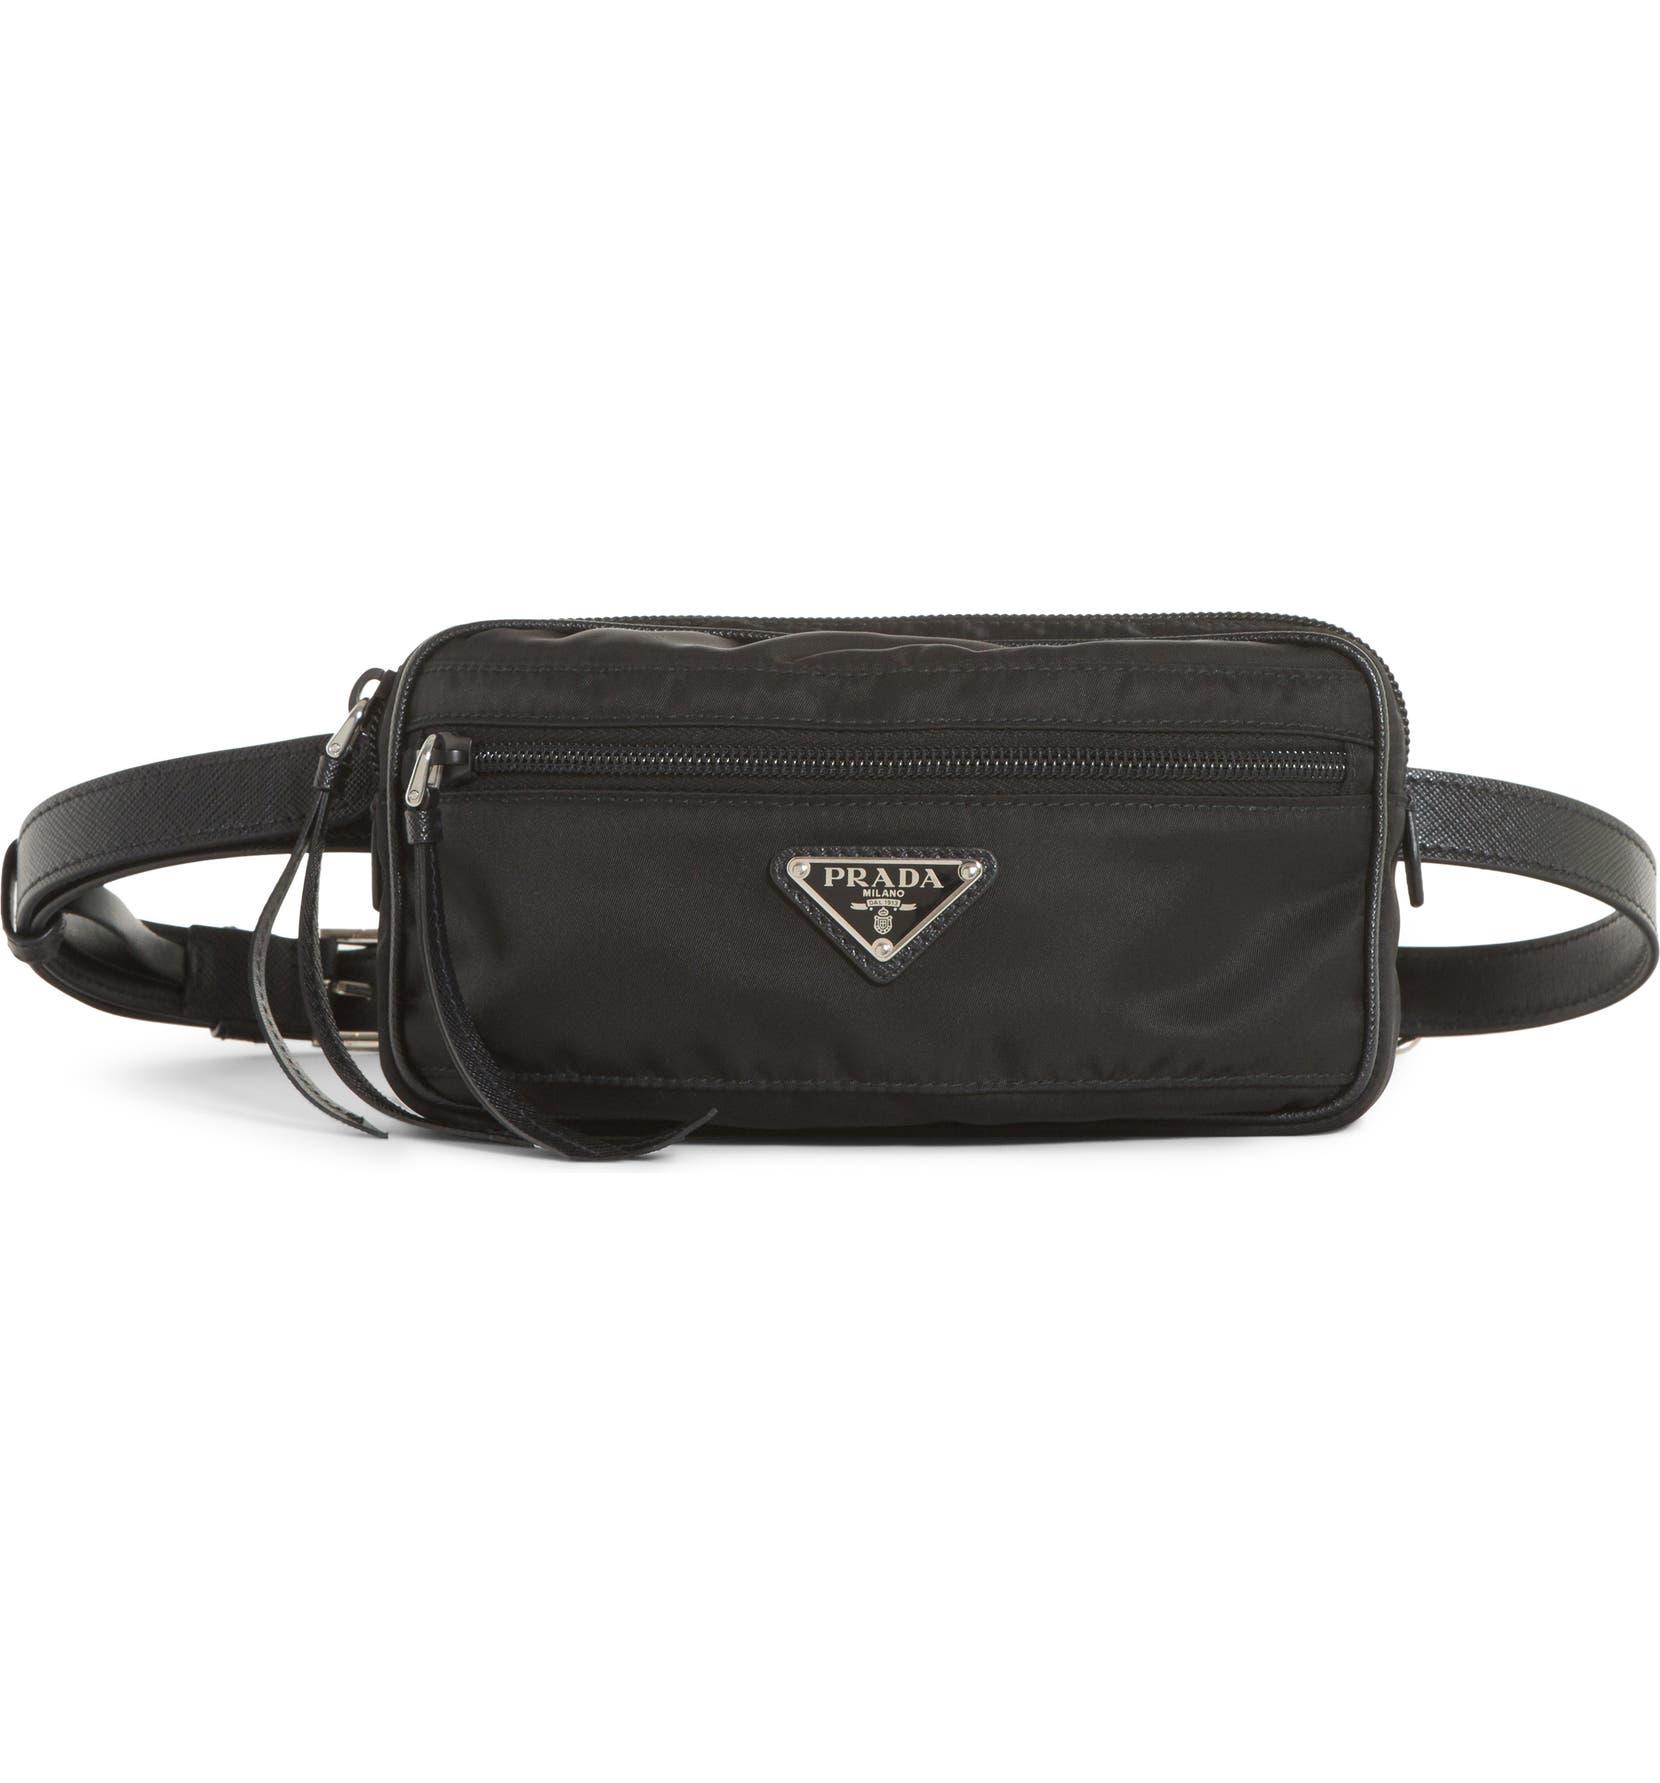 266a0fd3a409 Prada Small Nylon Belt Bag | Nordstrom